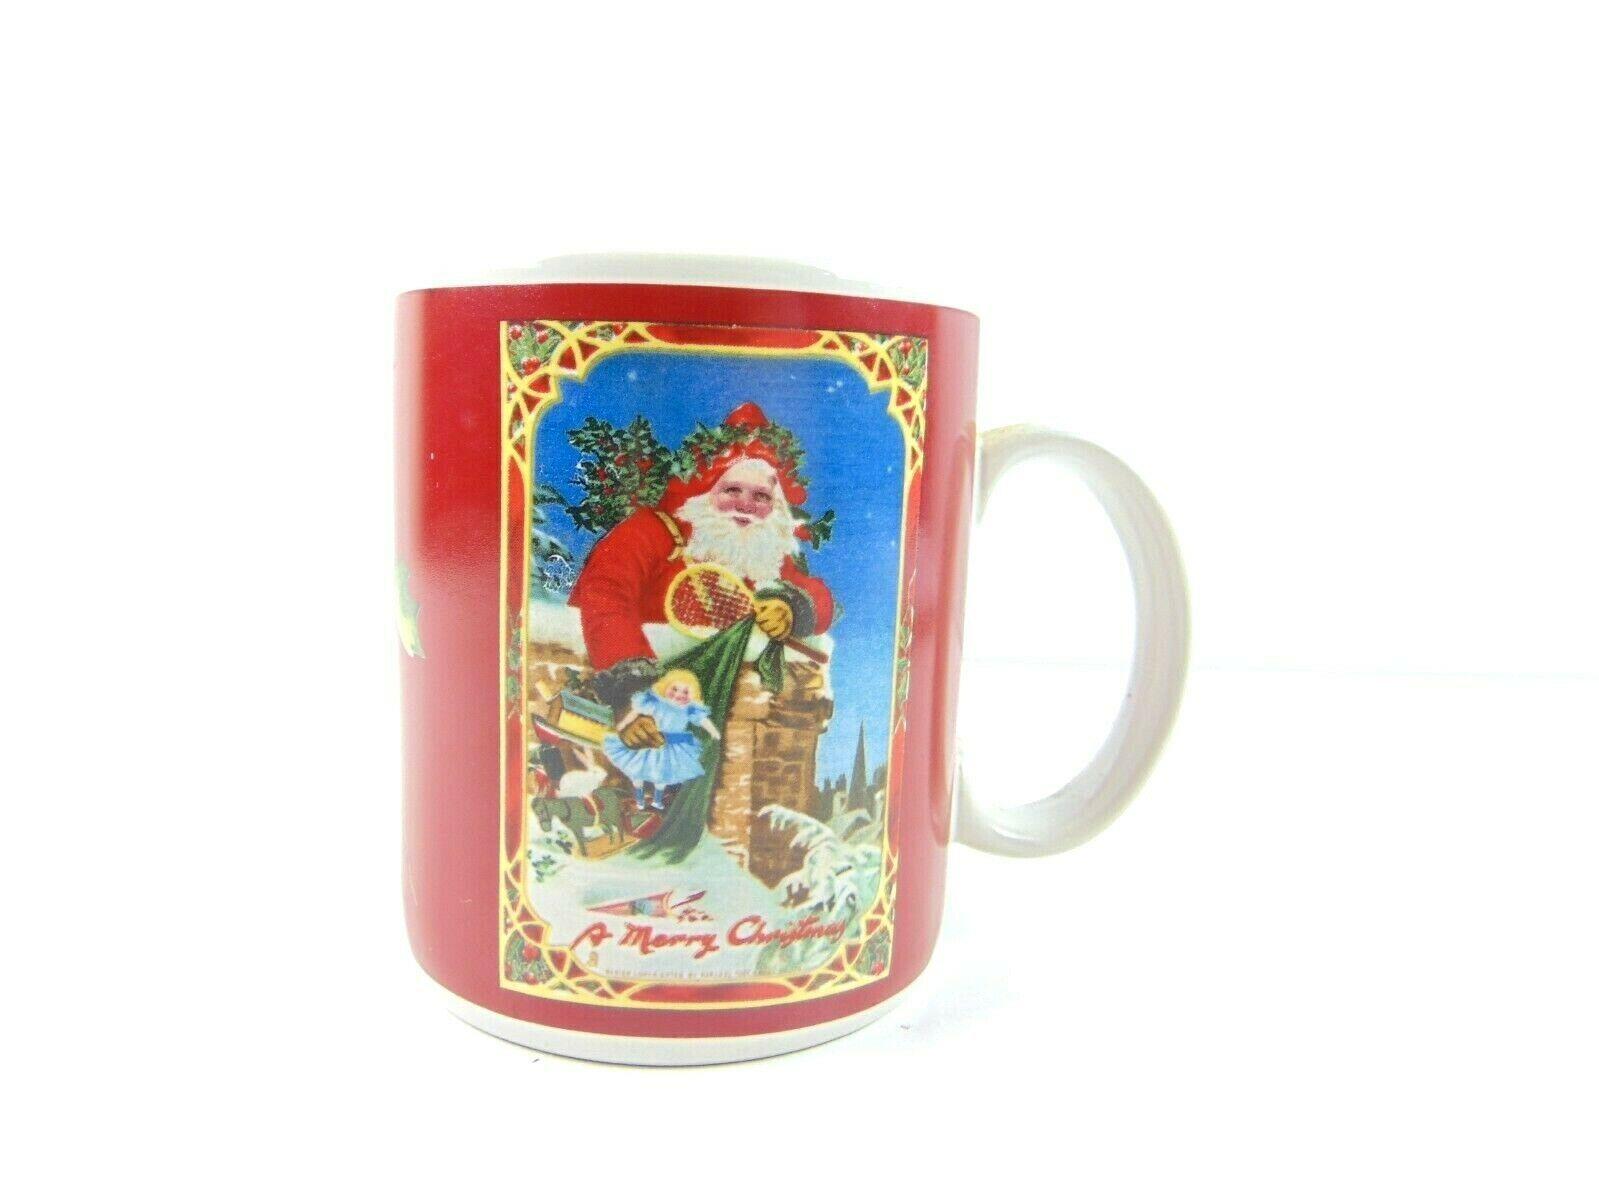 Enesco Imports Gifted Line 1986 A Merry Christmas Coffee Mug - $23.75